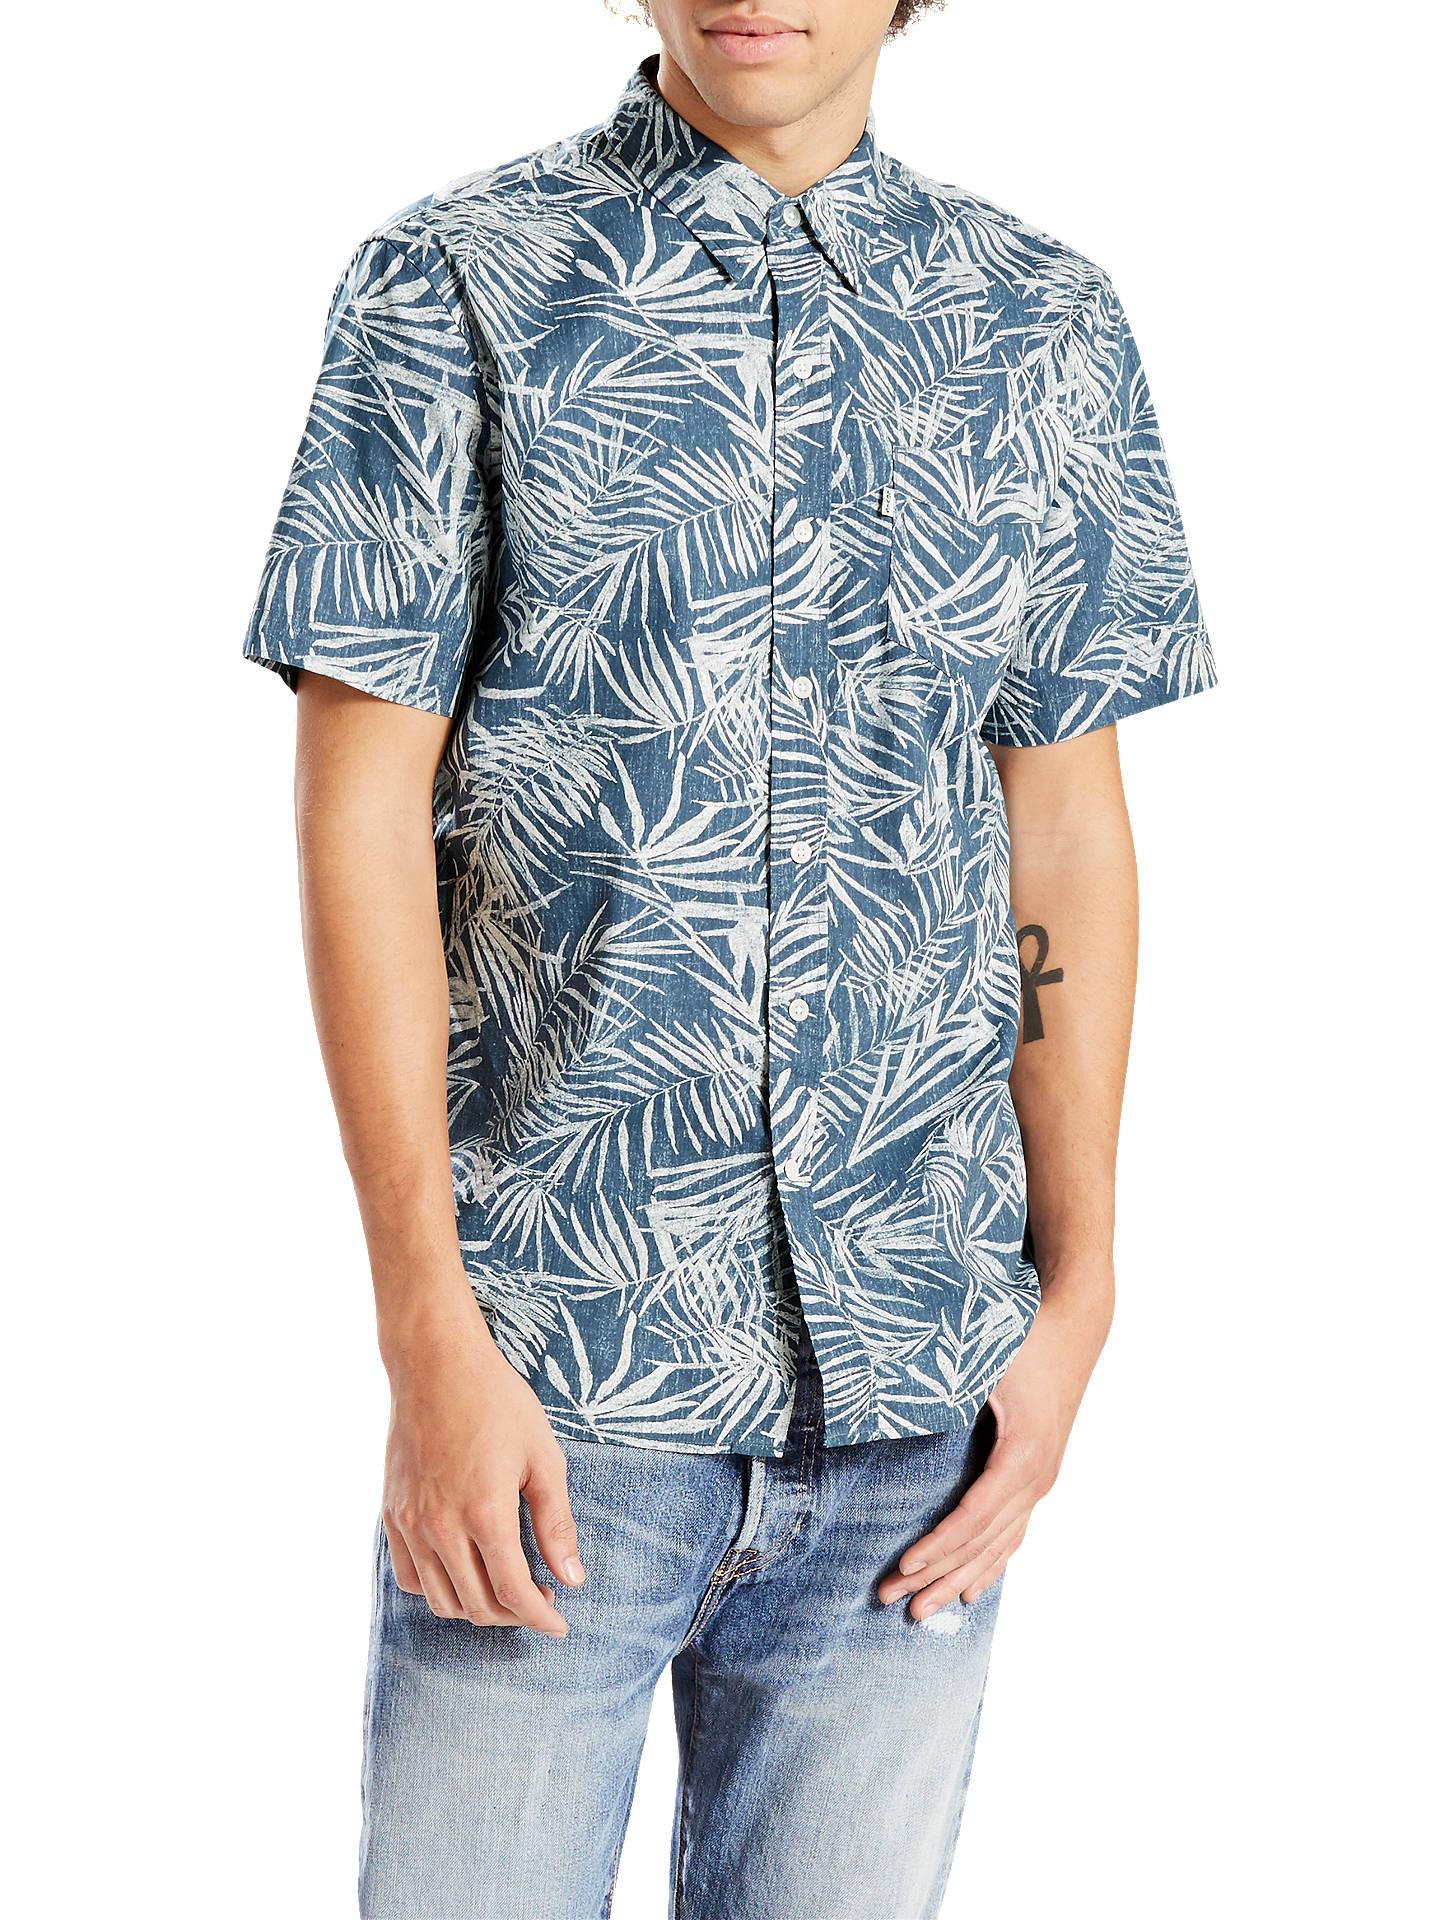 e688defc2 Buy Levi's Sunset One Corduroy Pocket Short Sleeve Shirt, Dress Blues, S  Online at ...